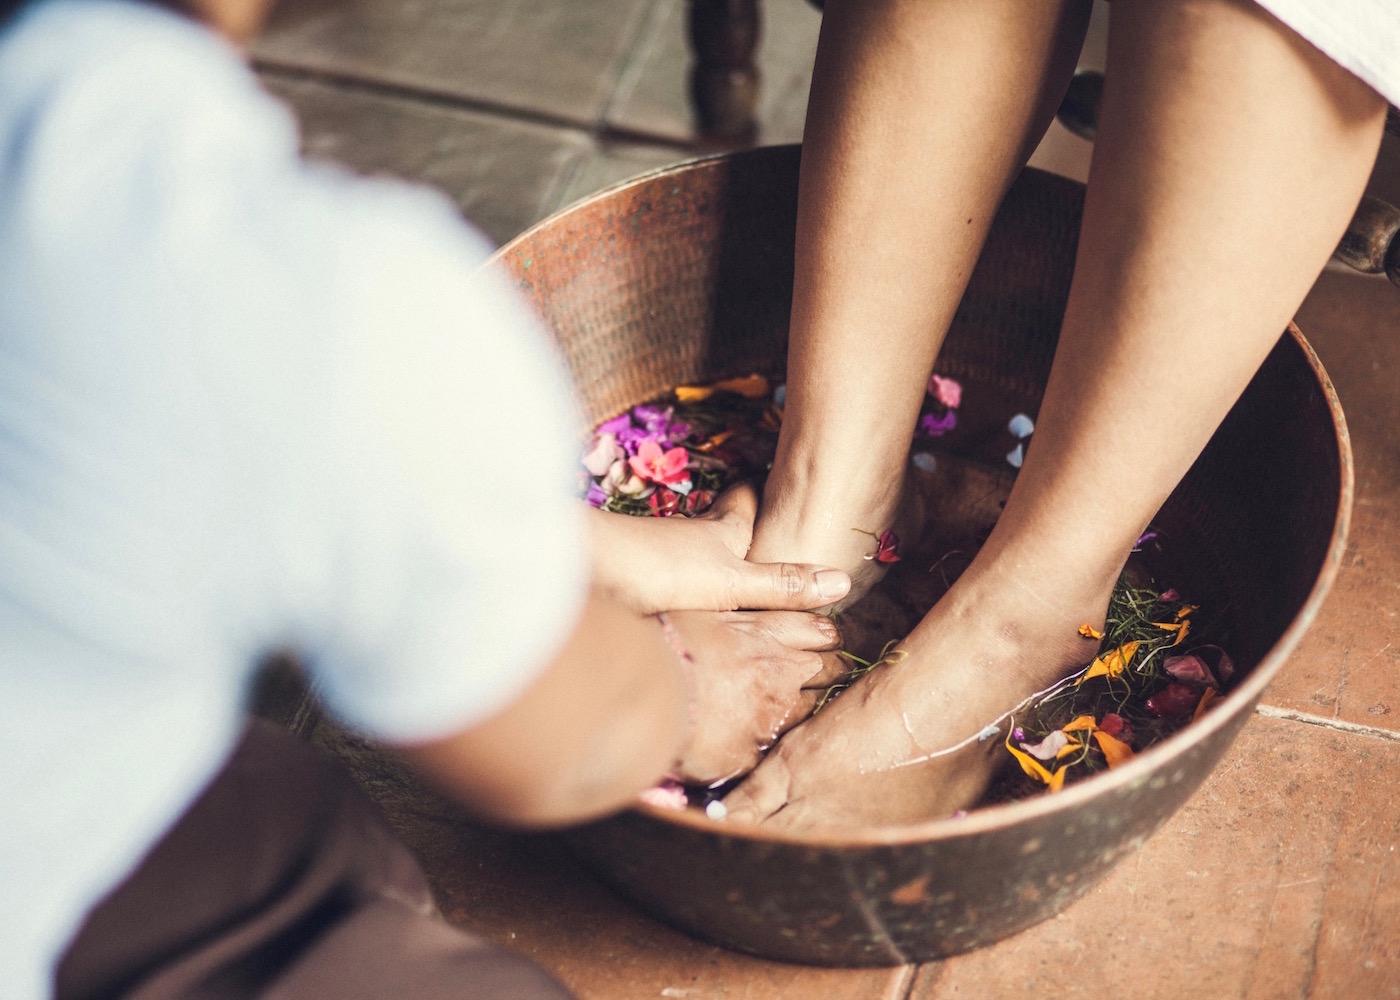 Foot ritual at Desa Seni spa in Canggu - one of the best spas in Bali, Indonesia